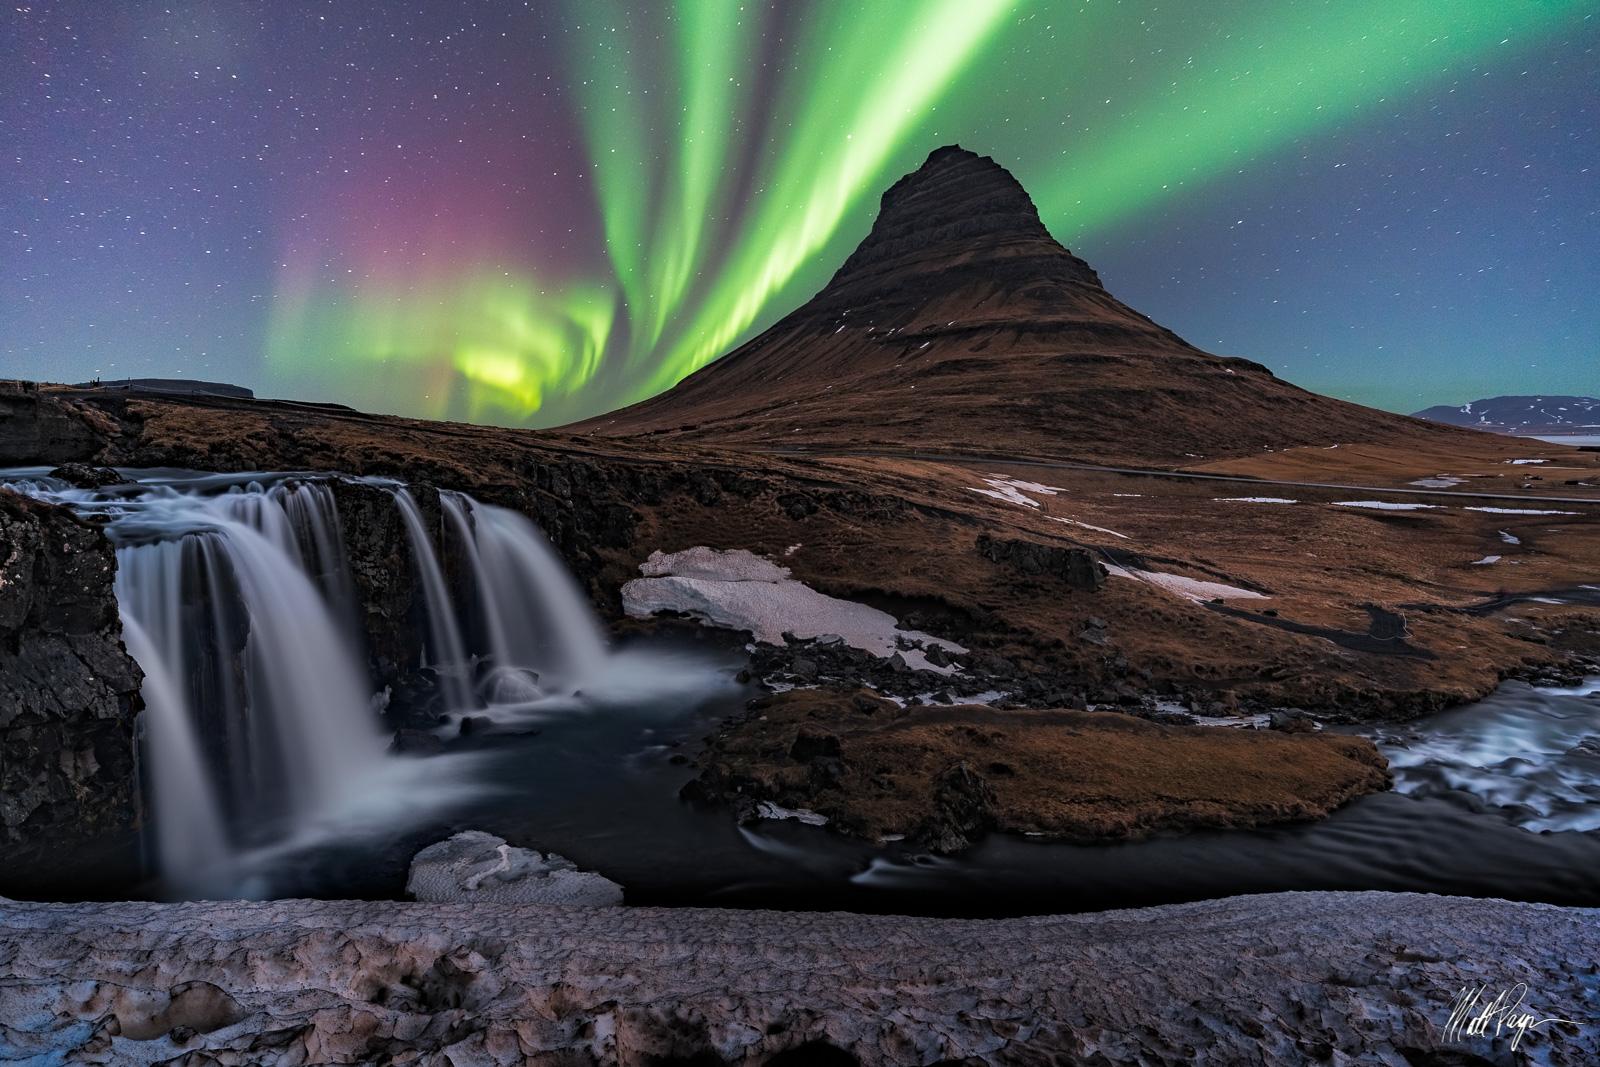 Aurora, Aurora Borealis, Composite, Iceland, Kirkjufell, Landscape,  Mountain, Night, Nightscape, Snaefellsnes Peninsula,  Waterfall, beautiful, photo